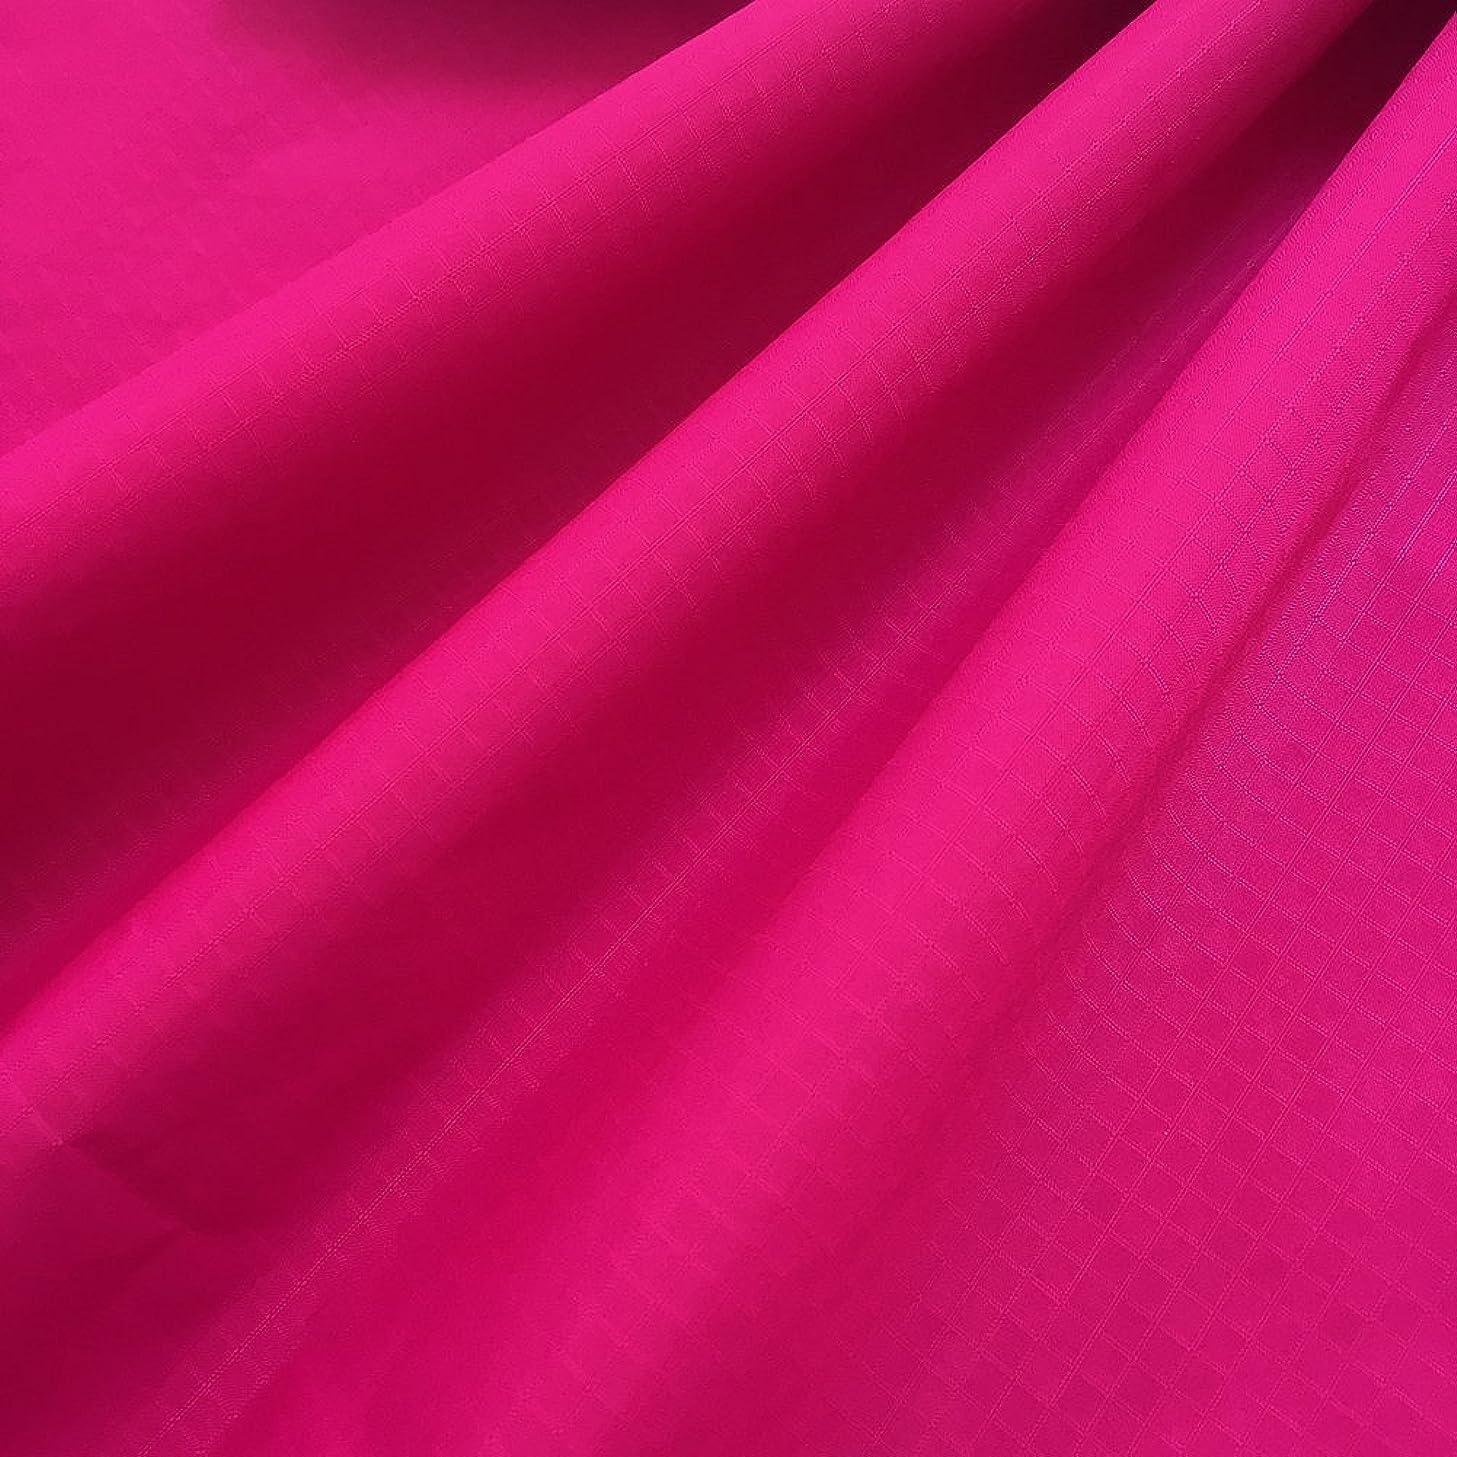 EMMAKITES Hot Pink Ripstop Nylon Fabric 60